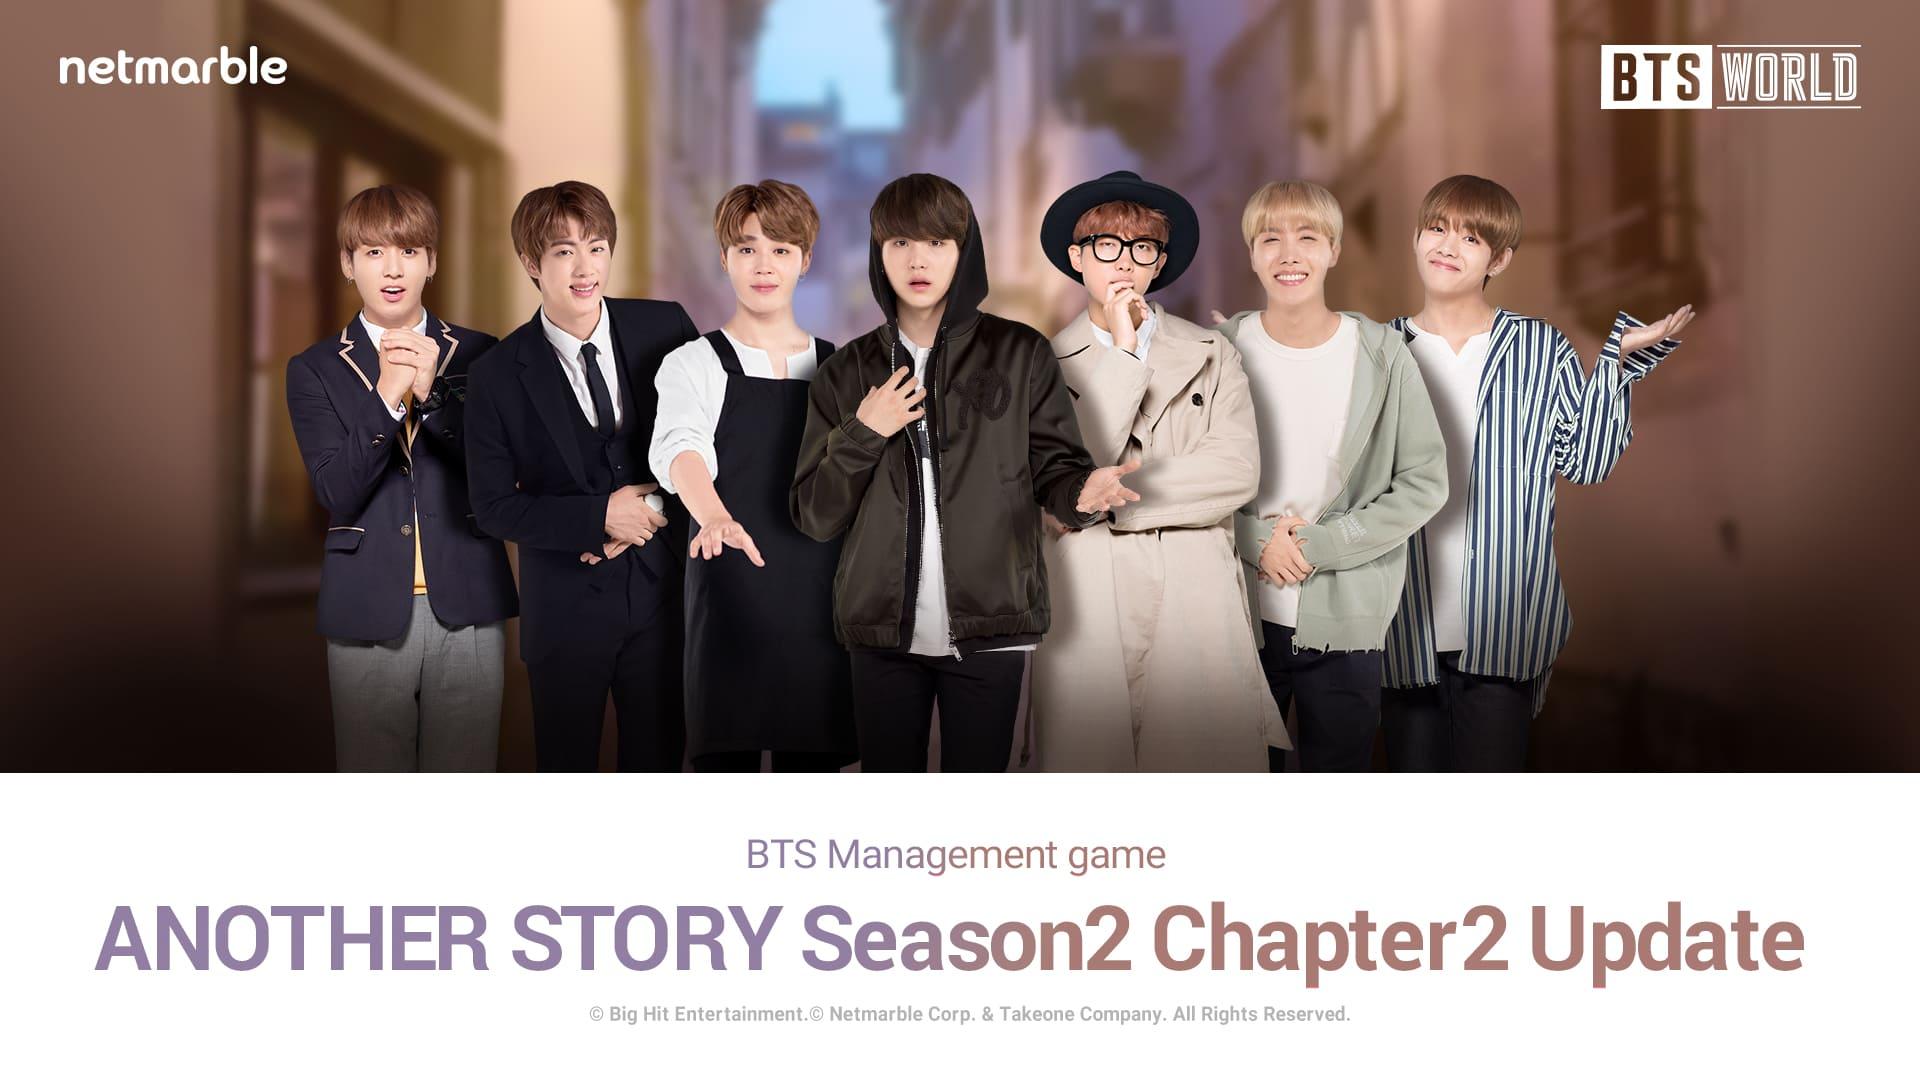 《BTS WORLD》迎更新 Another Story全新章節登場